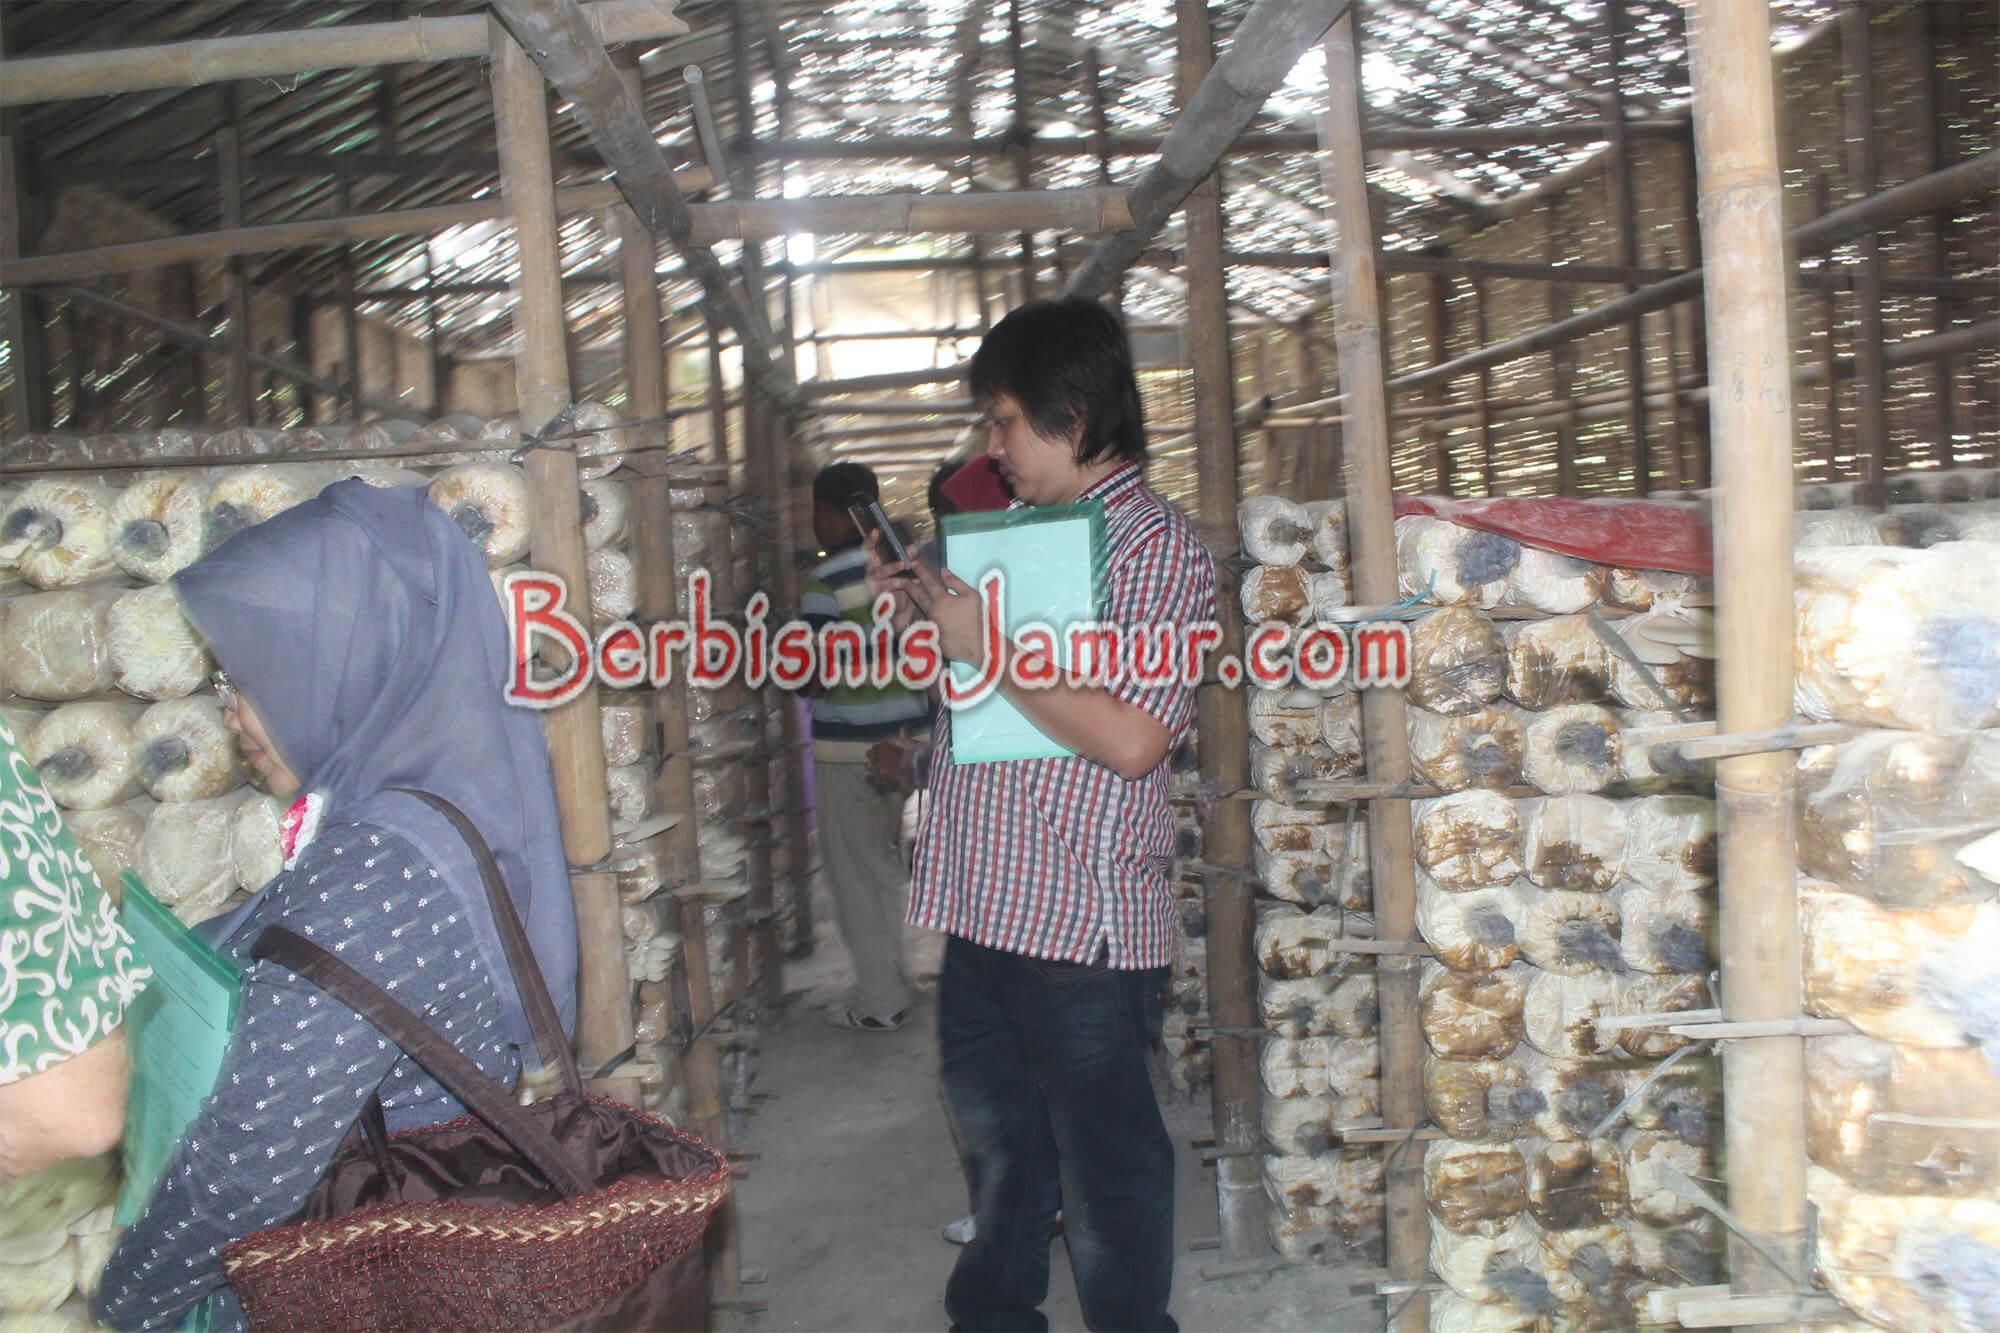 Kunjungan Peserta ke Kumbung Jamur